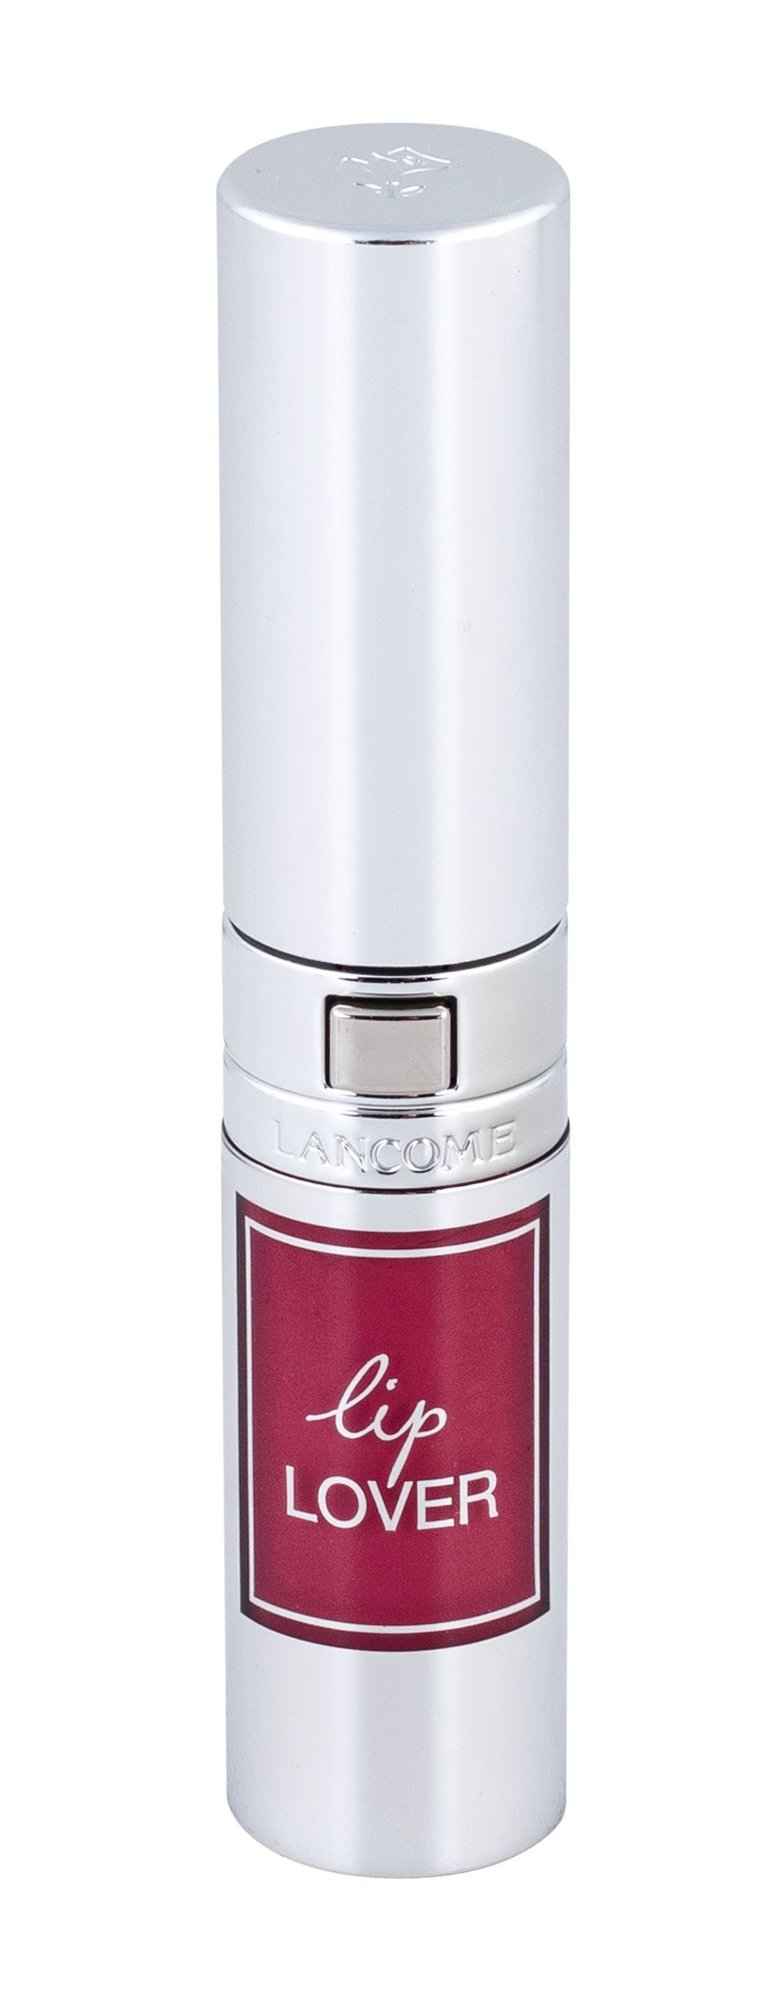 Lancôme Lip Lover Cosmetic 4,5ml 338 Rose Des Cygnes